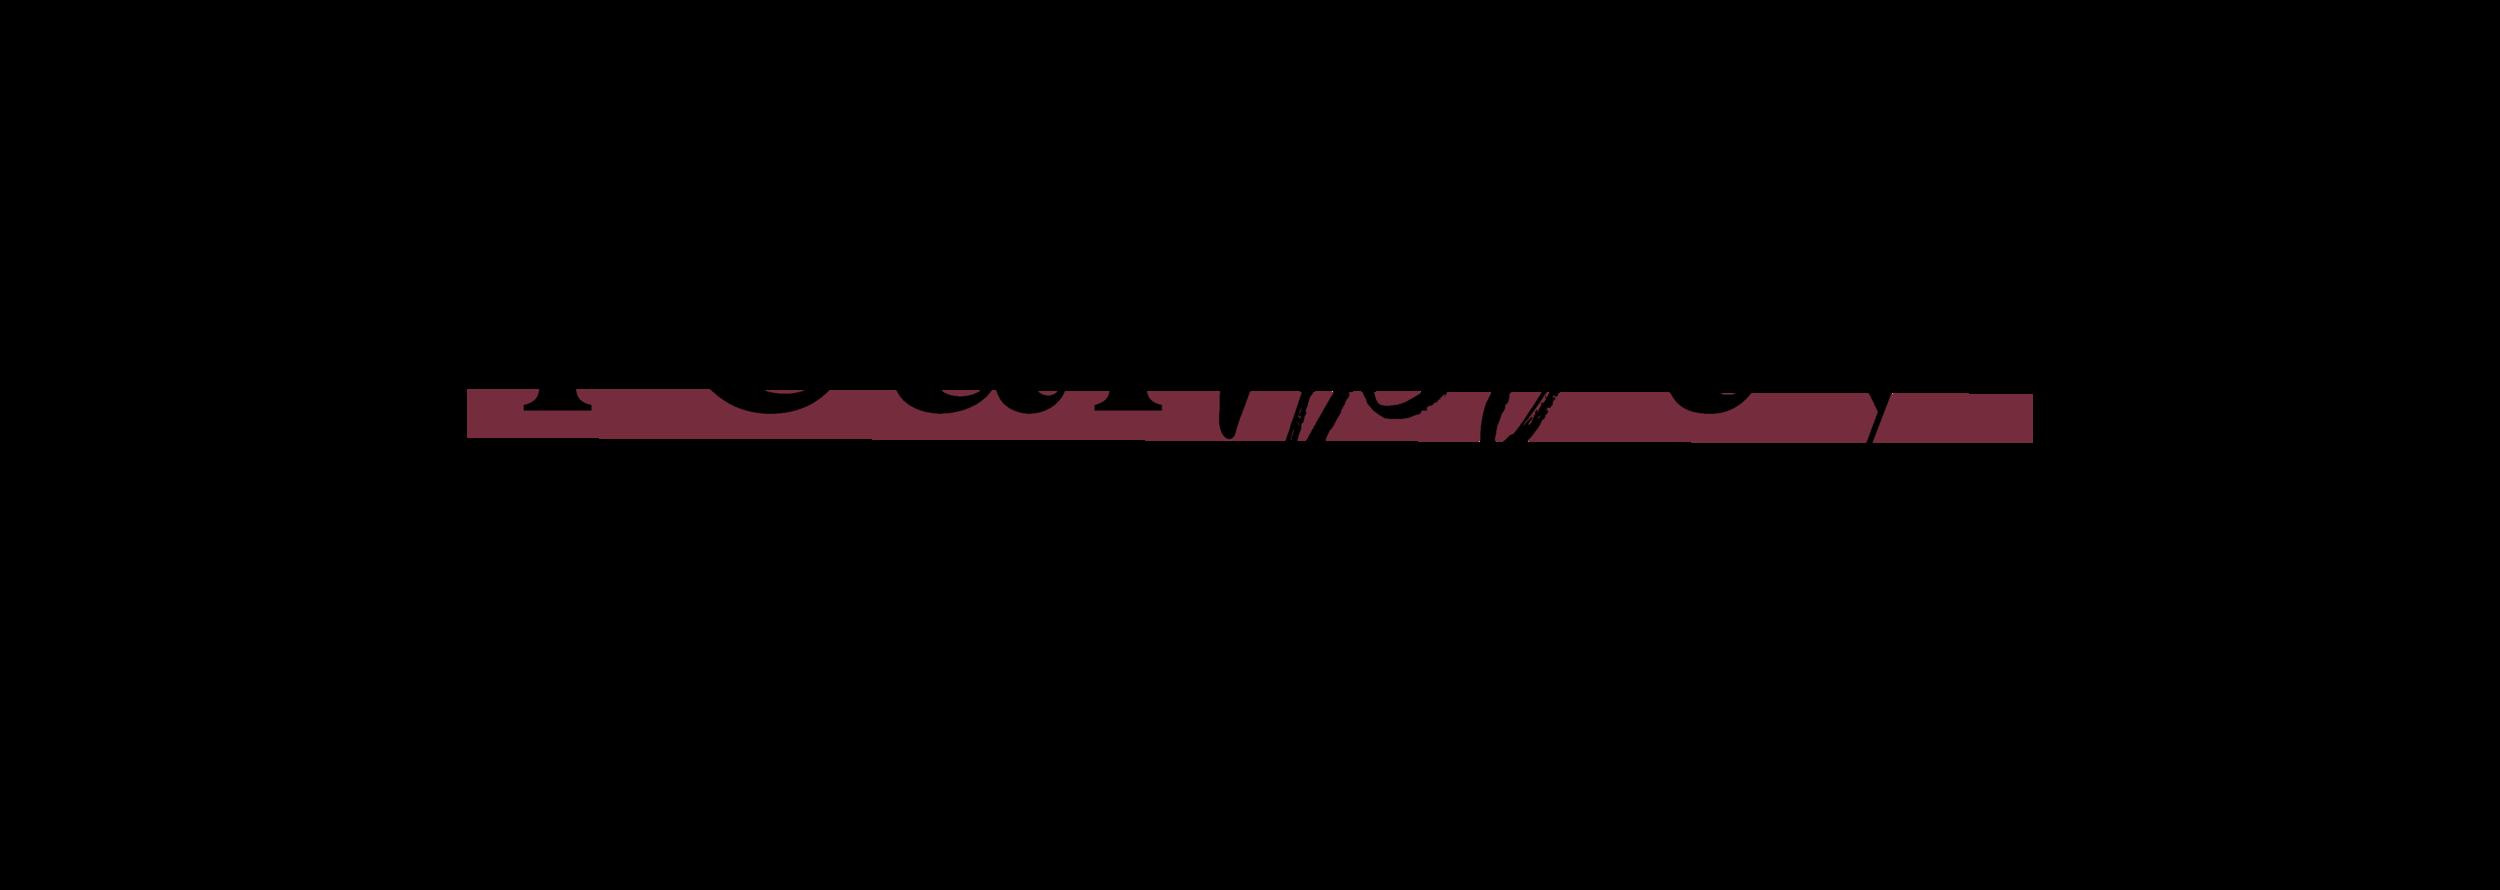 Realherty Logo Full.png